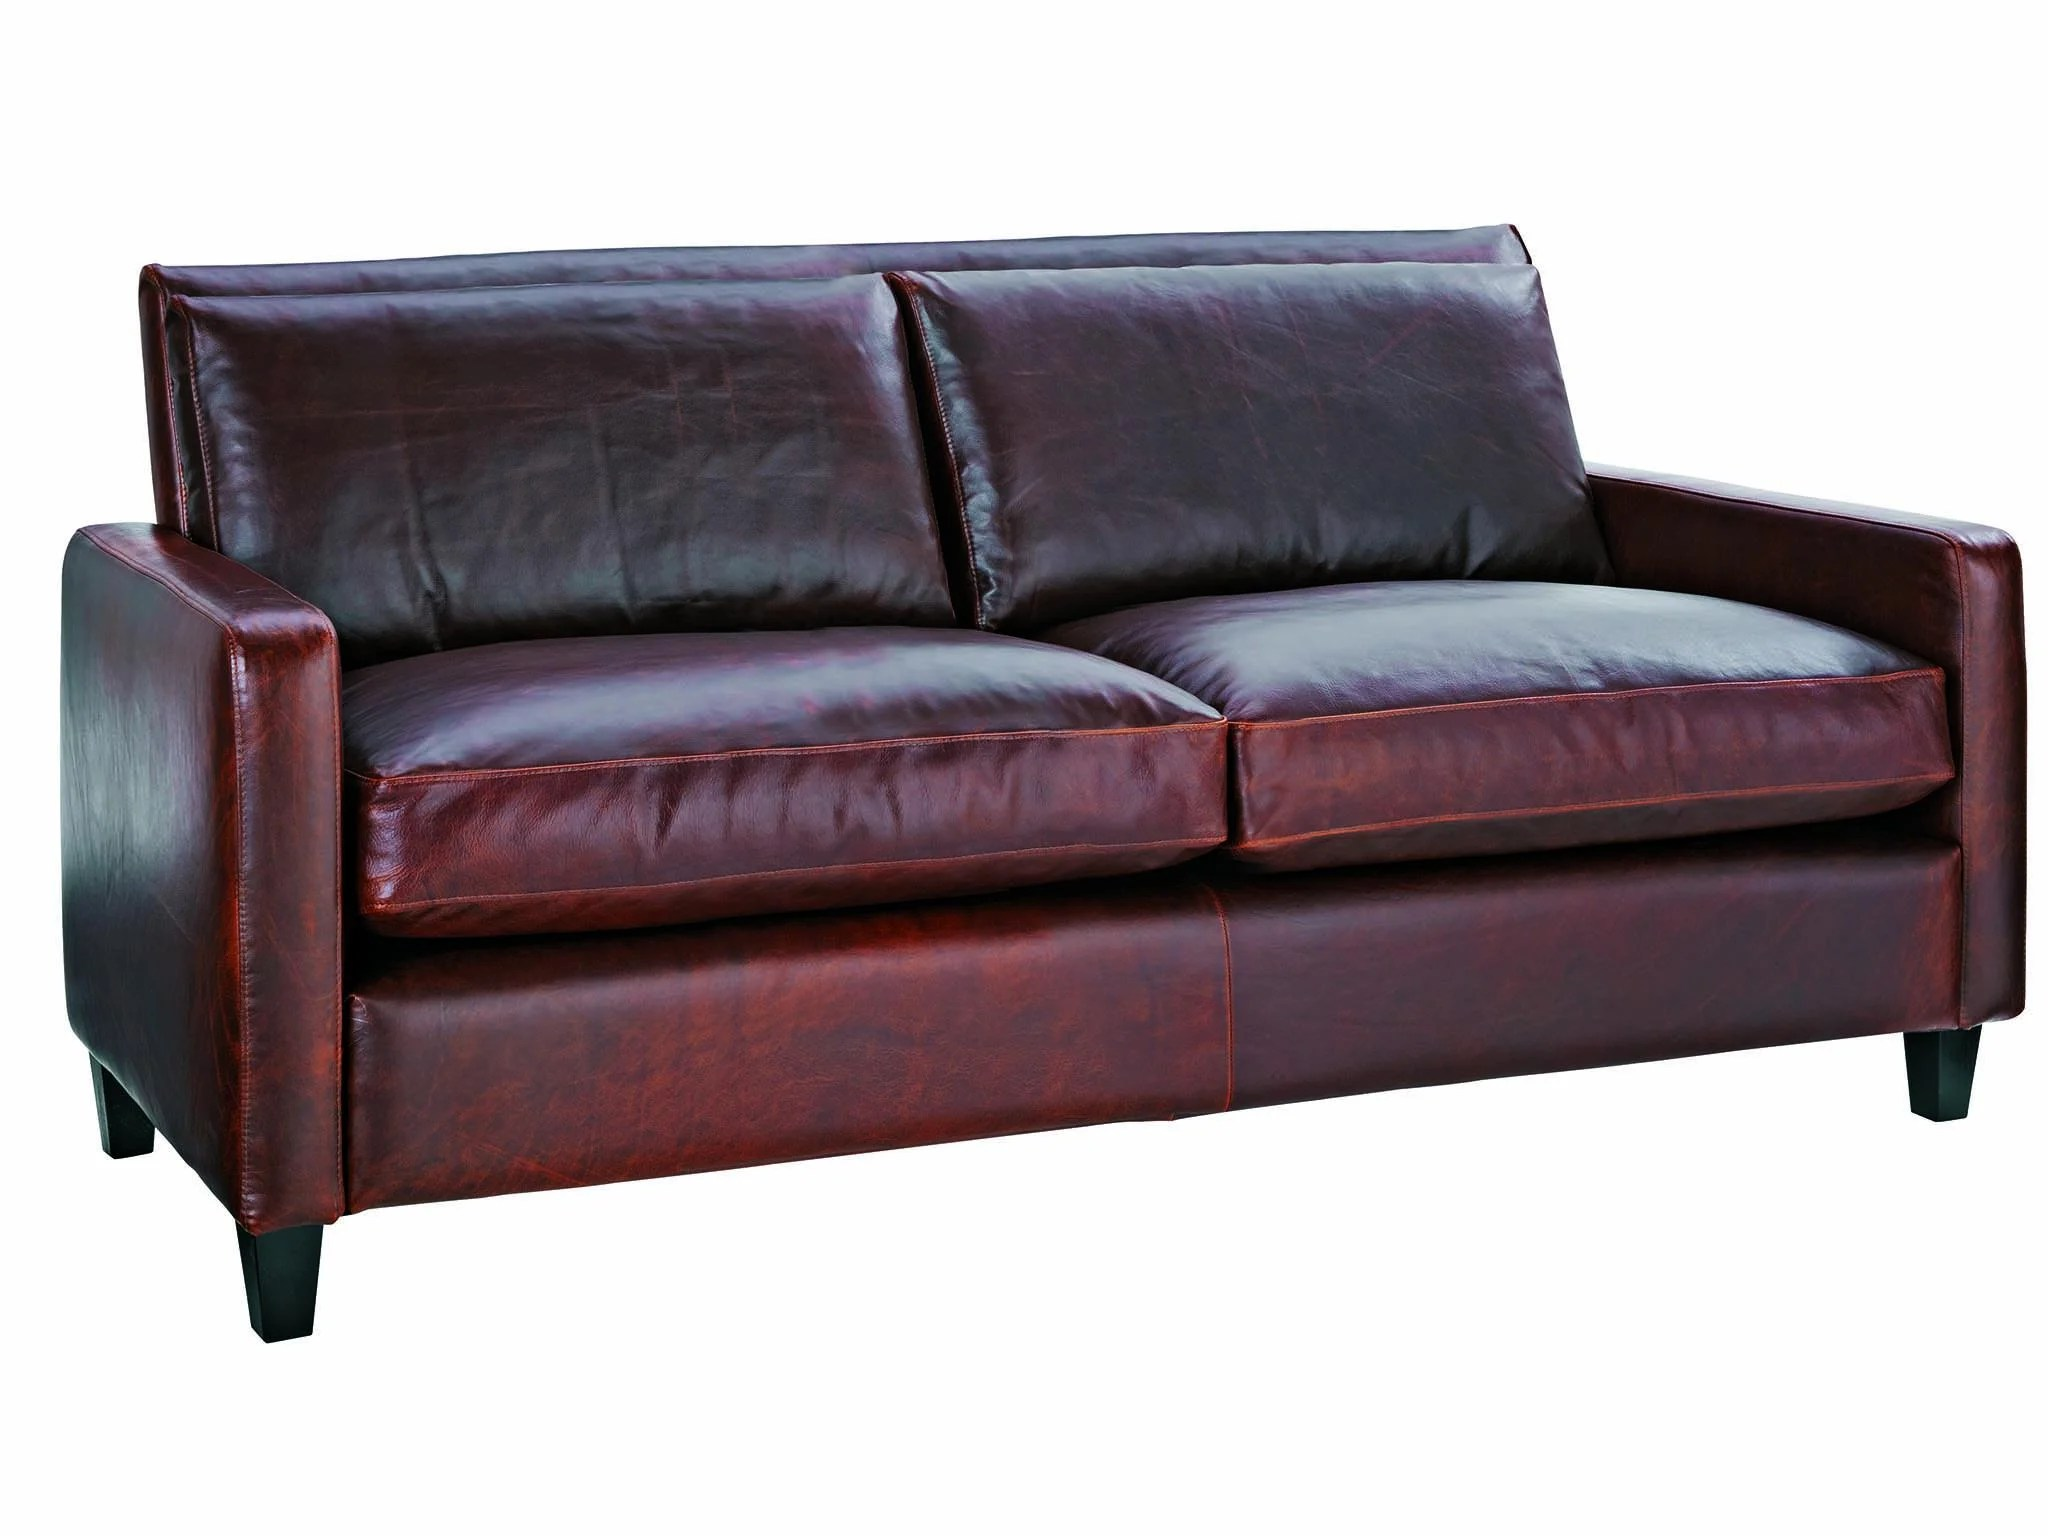 nicoletti lipari grey italian leather sofa chaise dfs dakota bed charcoal uk baci living room